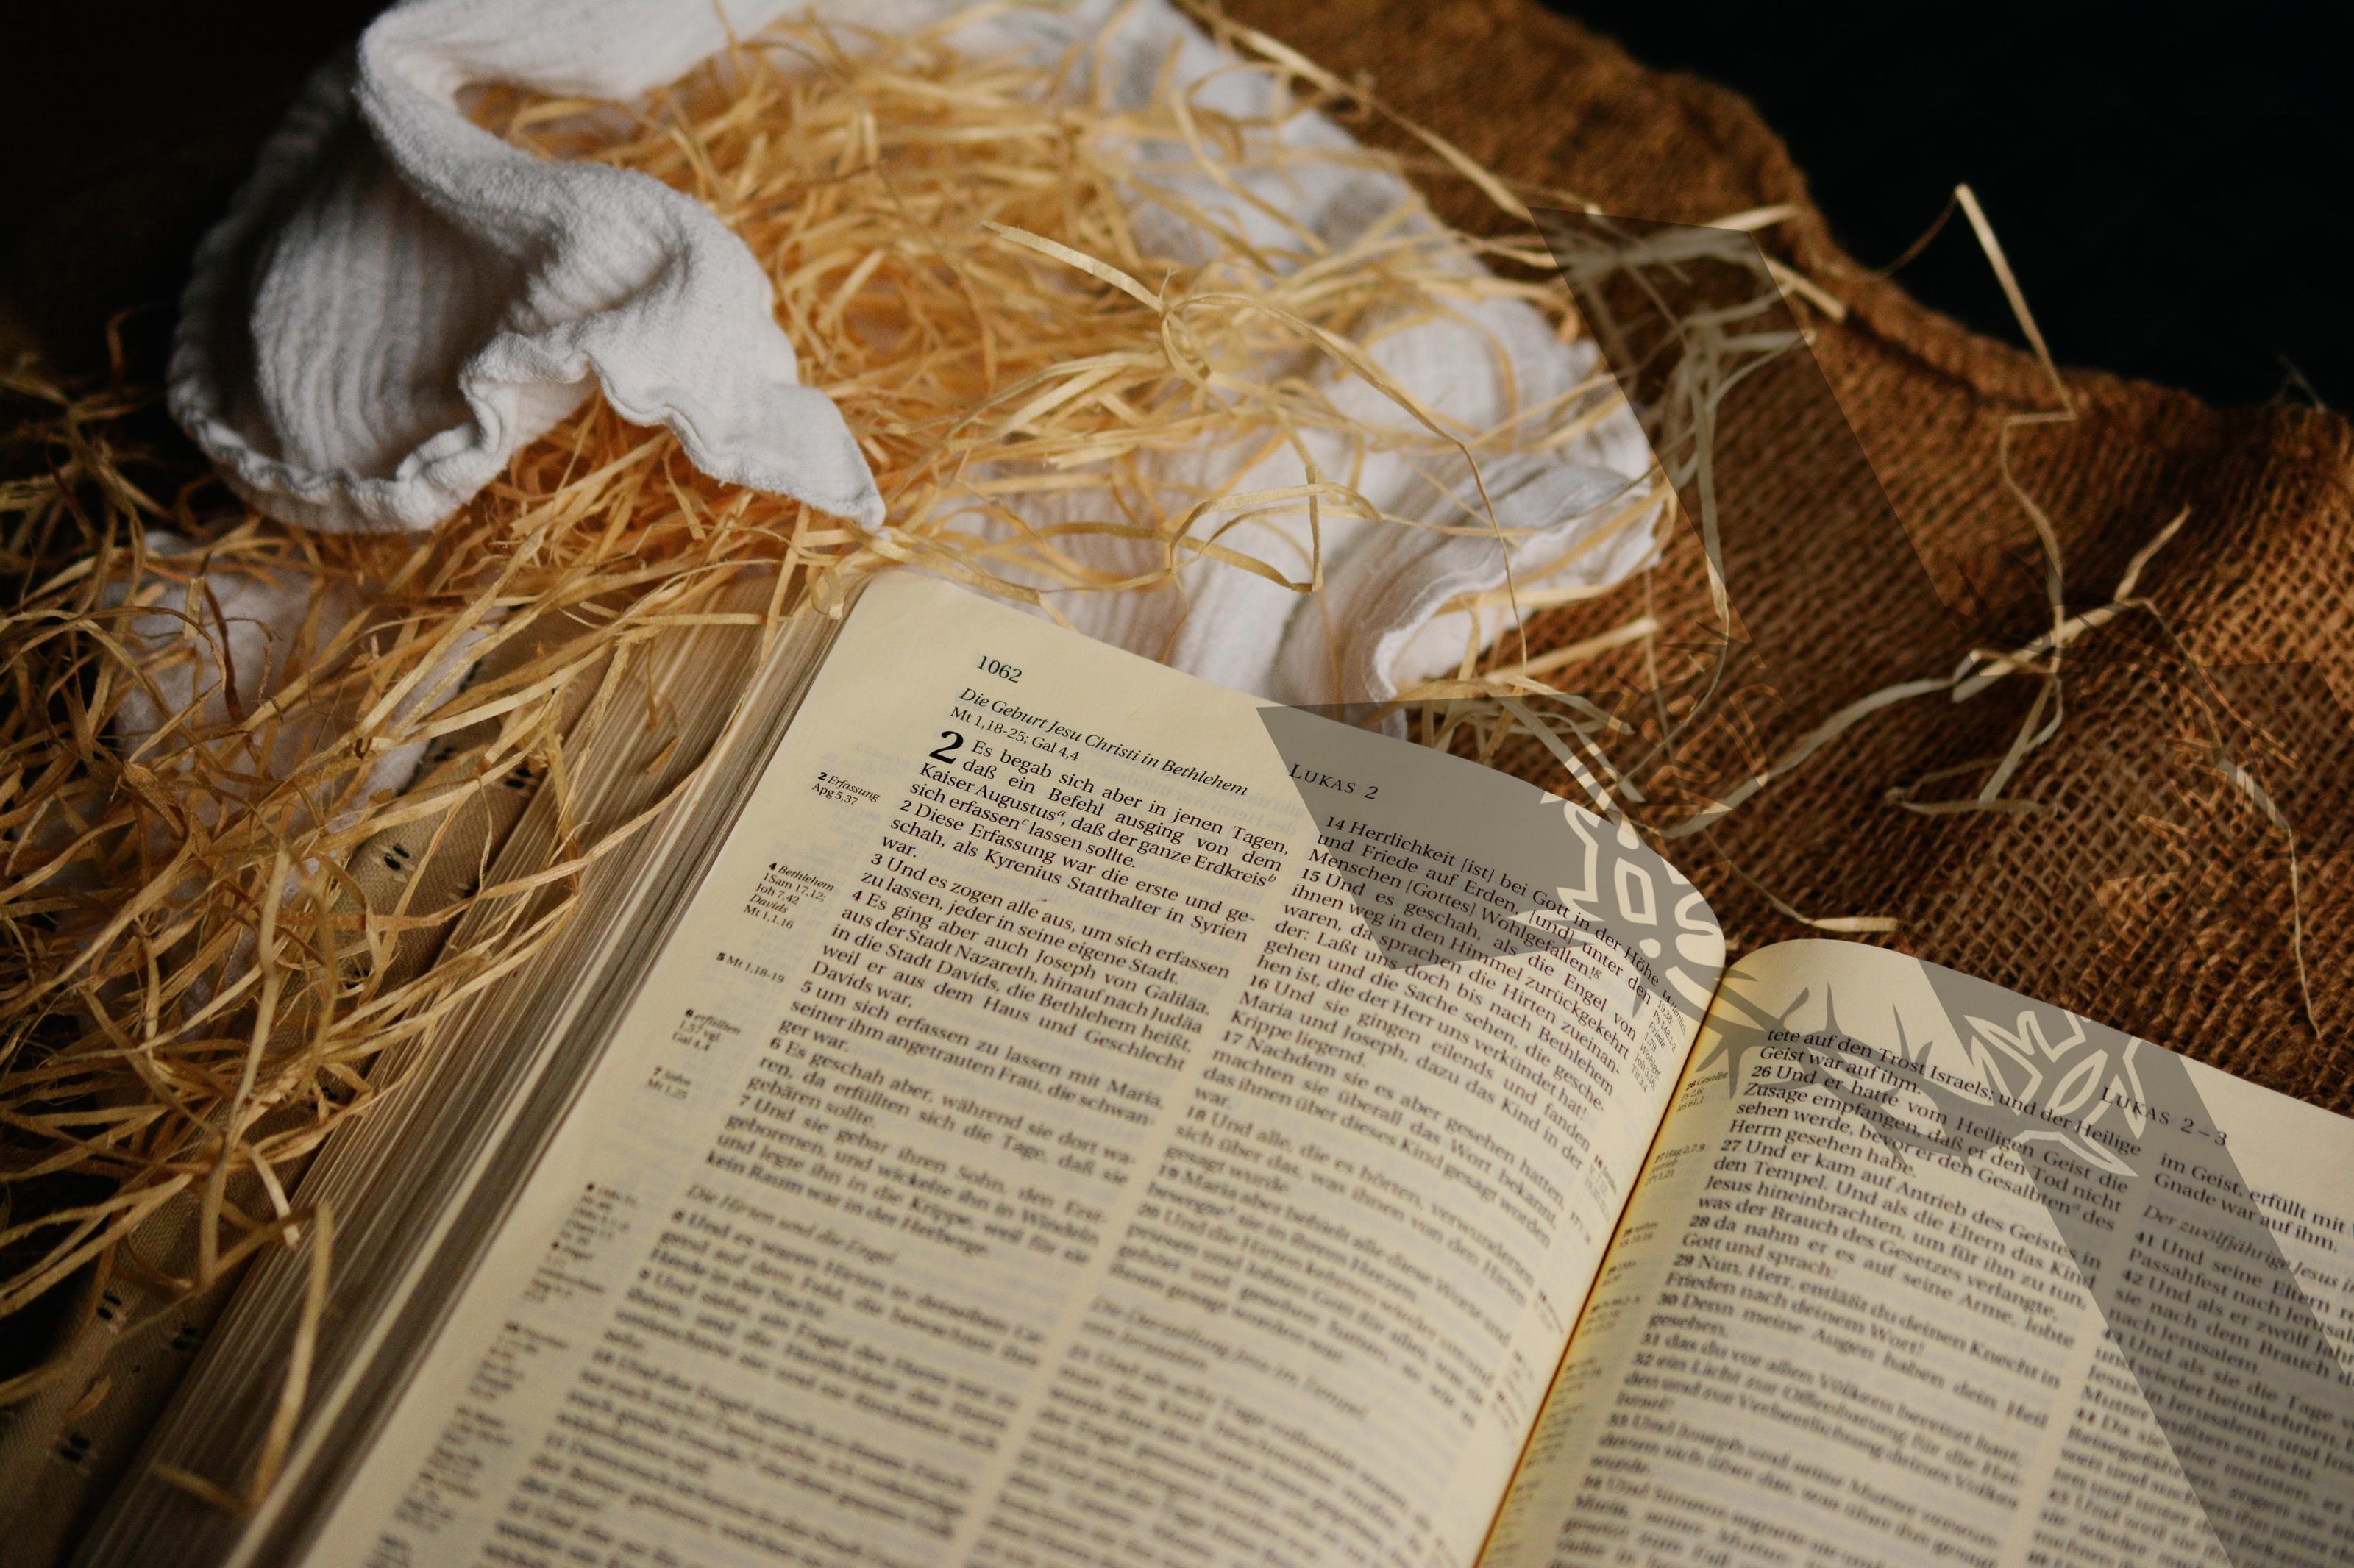 bible-1805790